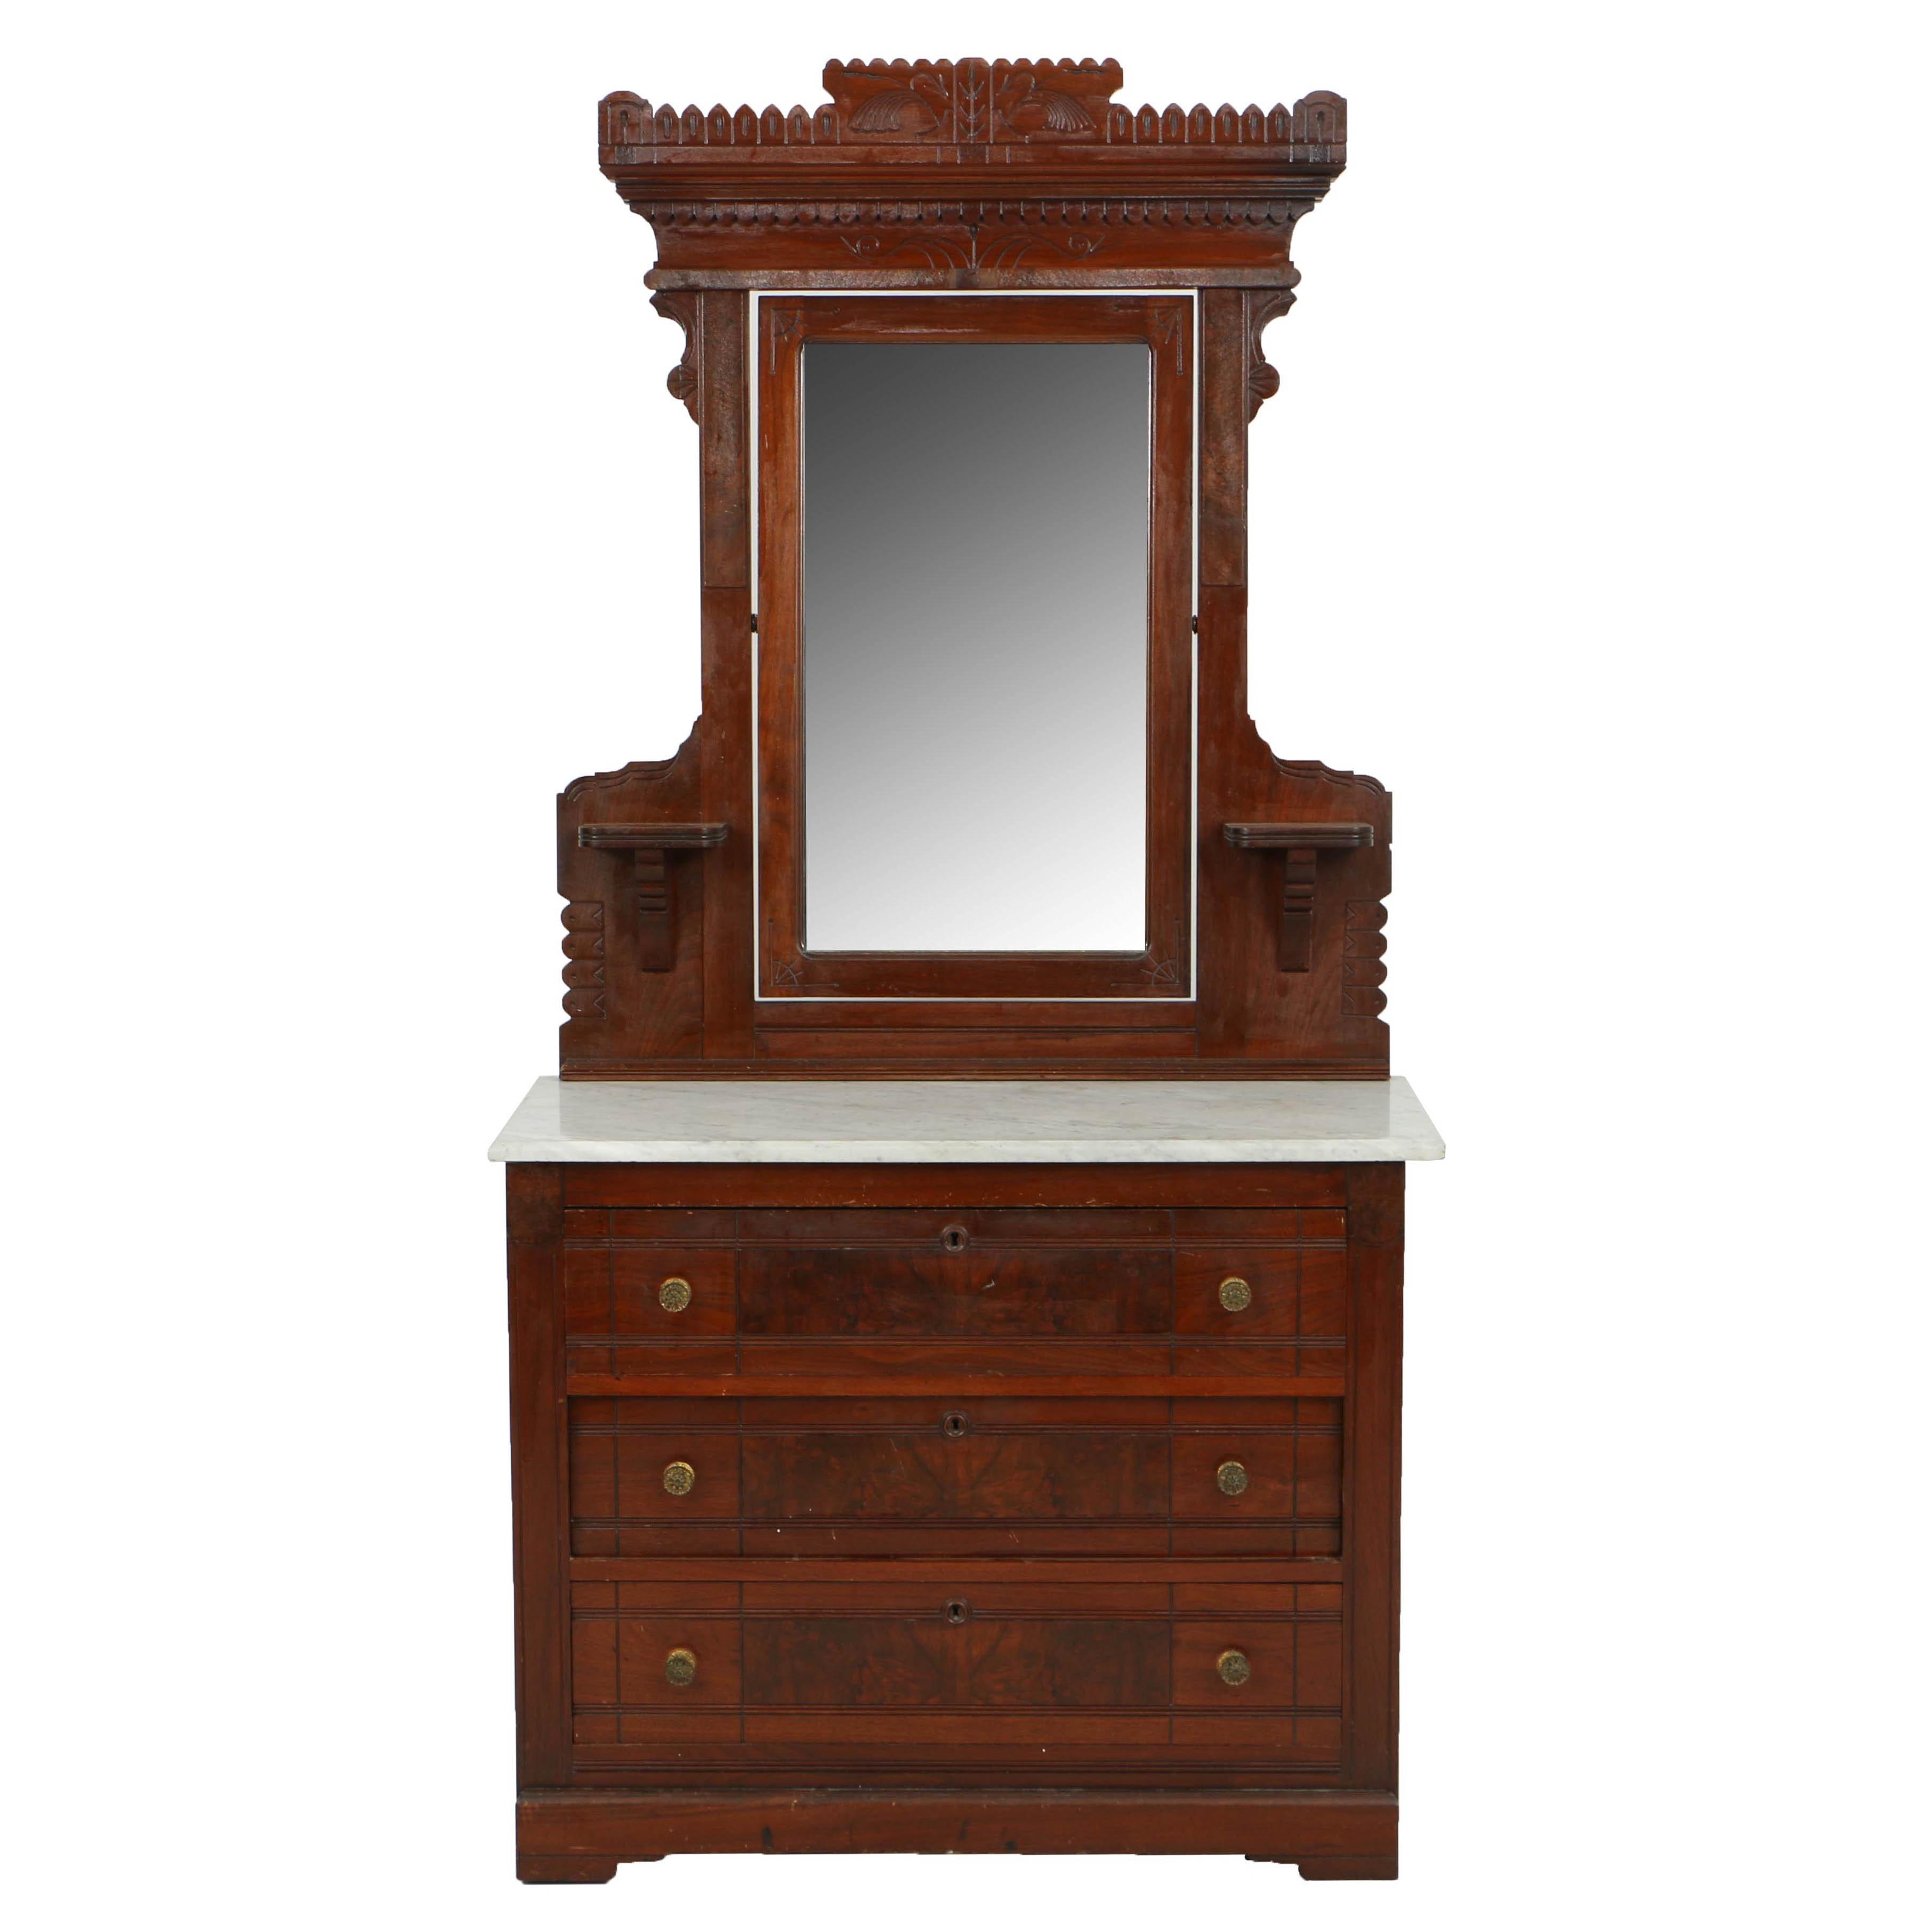 Antique Victorian Eastlake Walnut Dresser with Mirror, Circa Late 19th Century